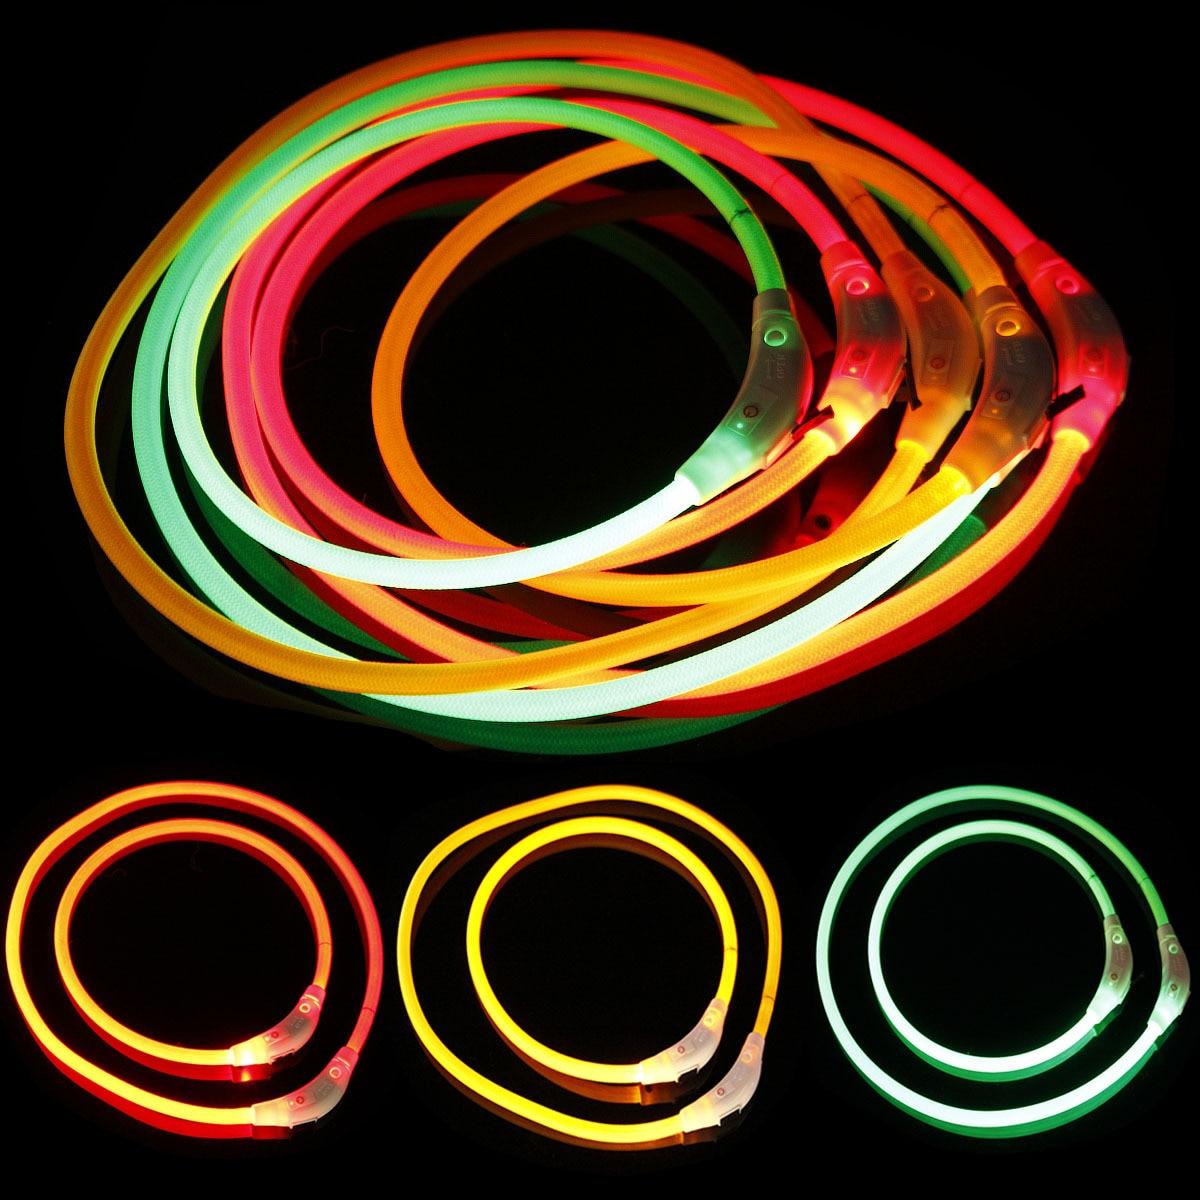 Weaving LED Shining Pet Dog Collar Bite-proof Protector Length 50 Cm 70 Cm Foreign Trade Cross Border Hot Goods